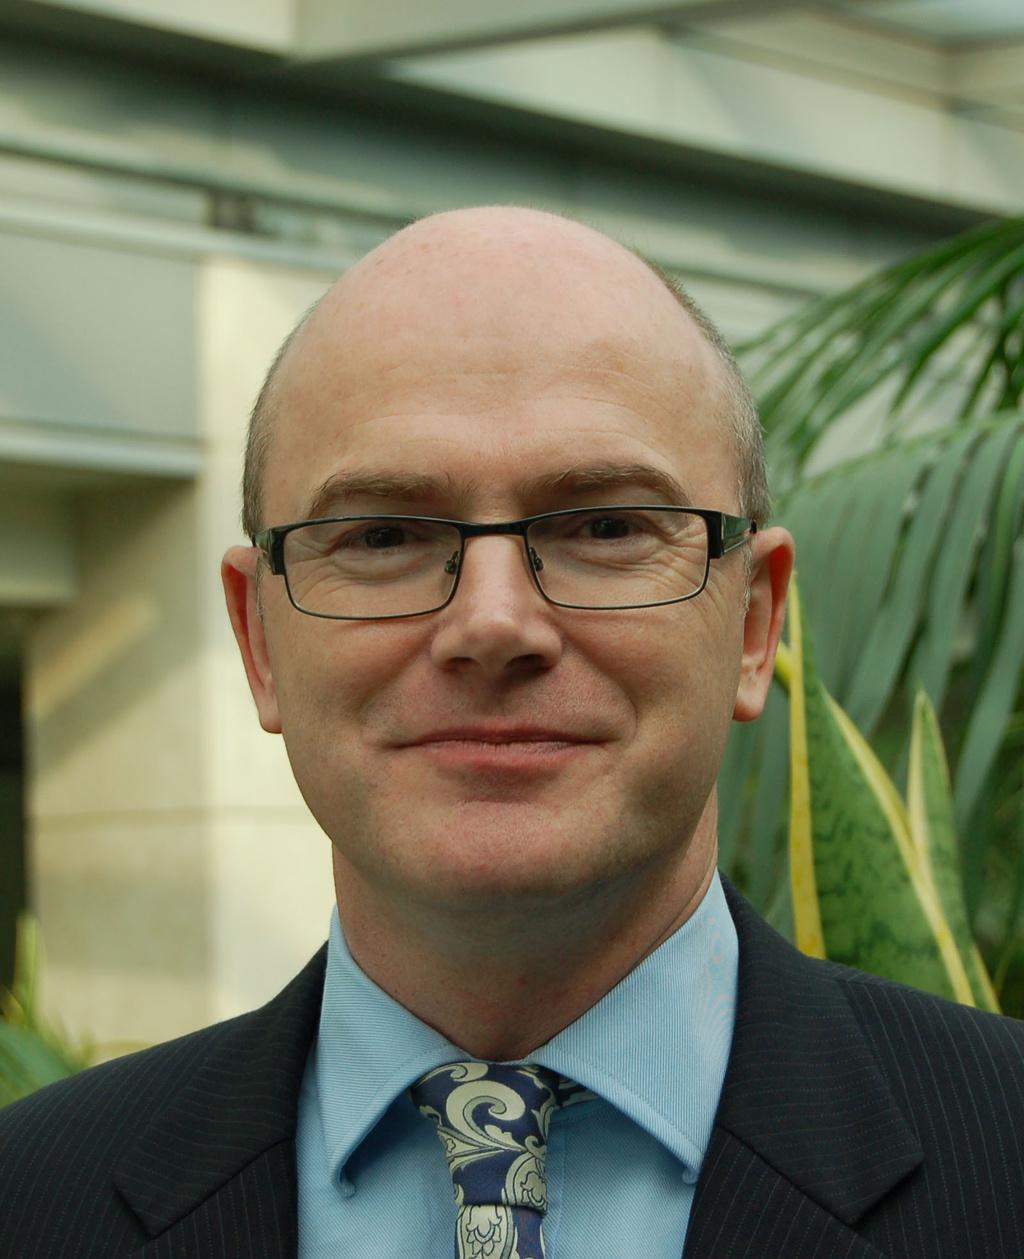 Michael Wight